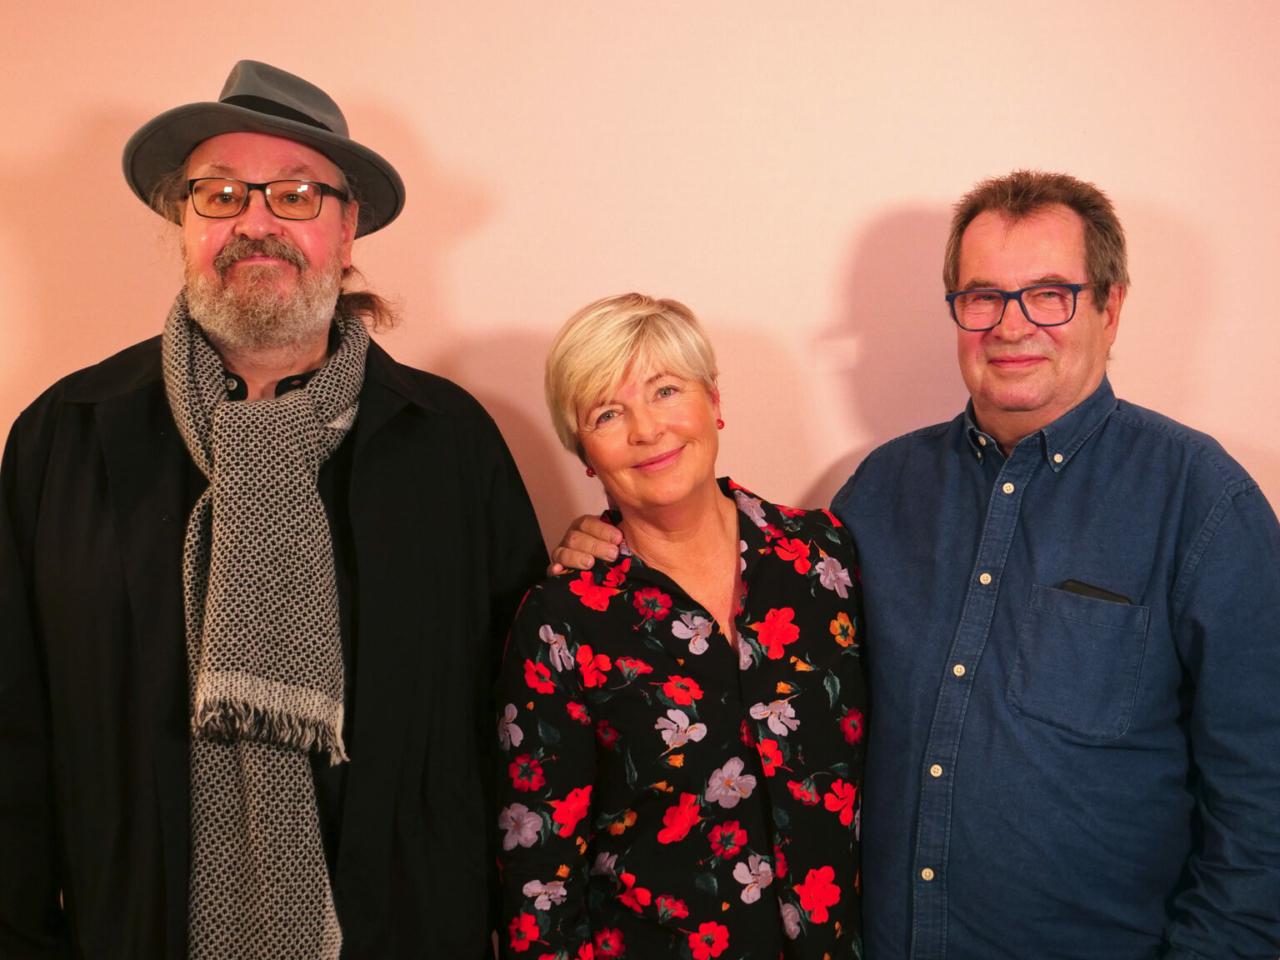 Henrik Palle, Lisbeth og Steen Bille til Storydays